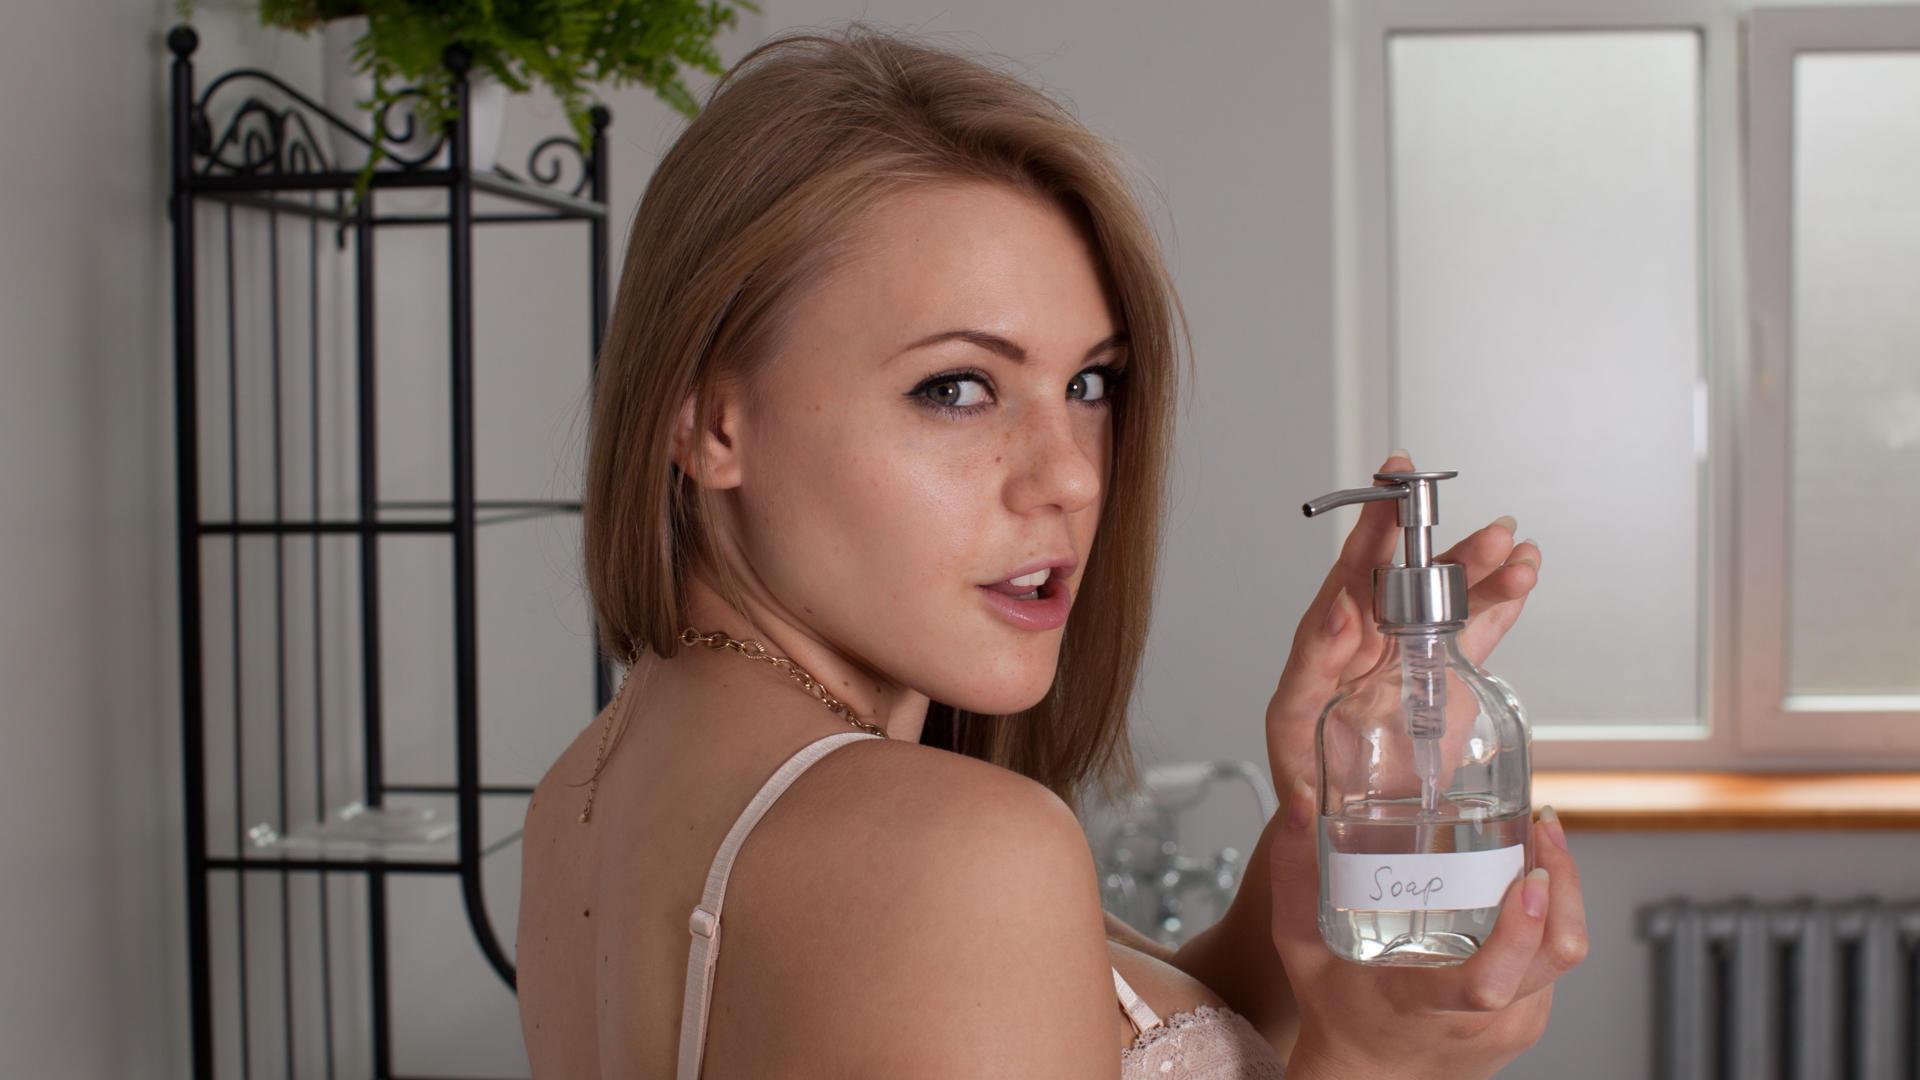 women, model, brunette, Femjoy.com, Viola Bailey, long hair, face, moles, smiling | 1667x2500